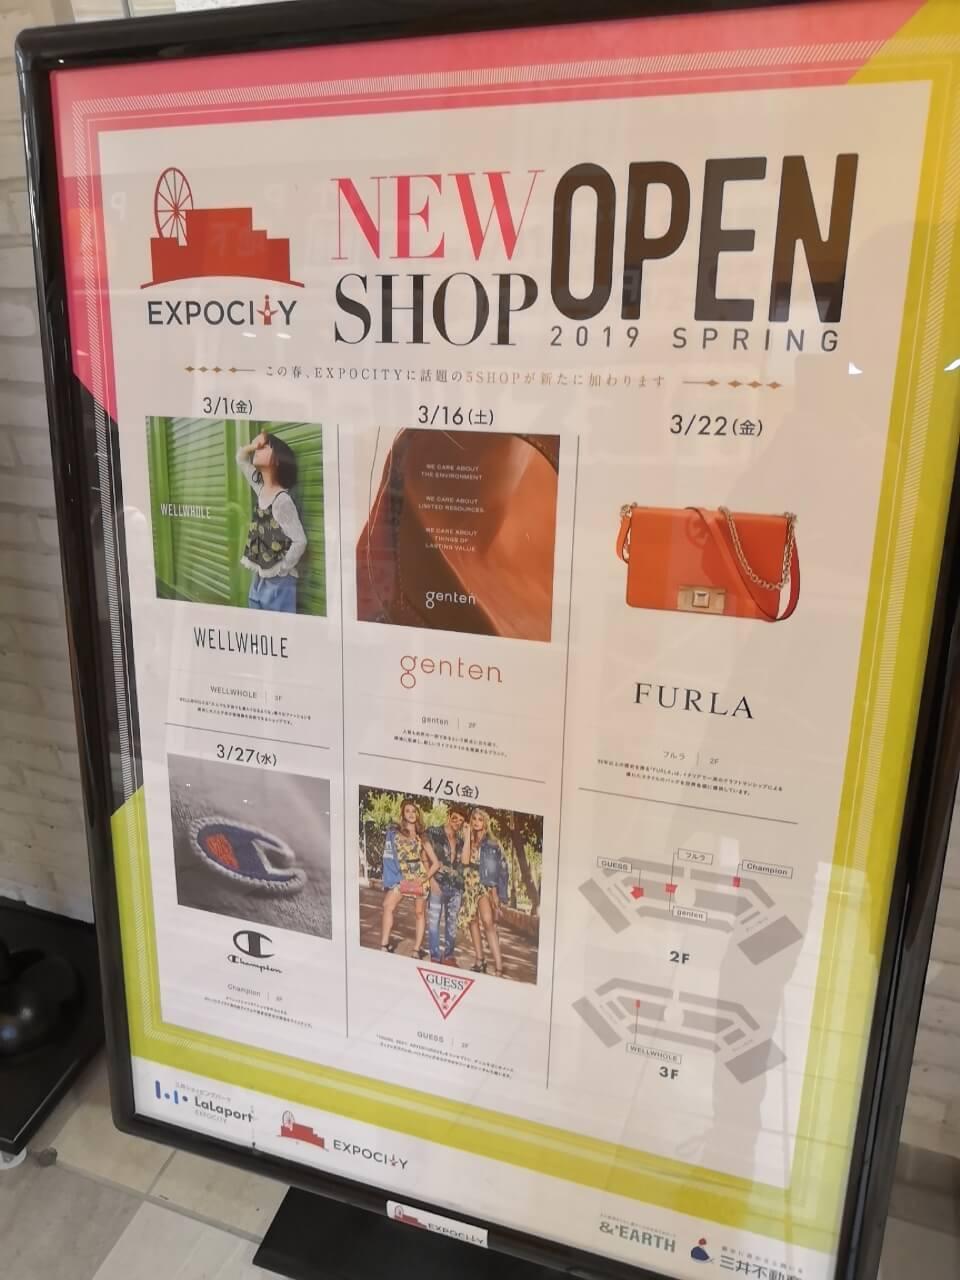 New open shop